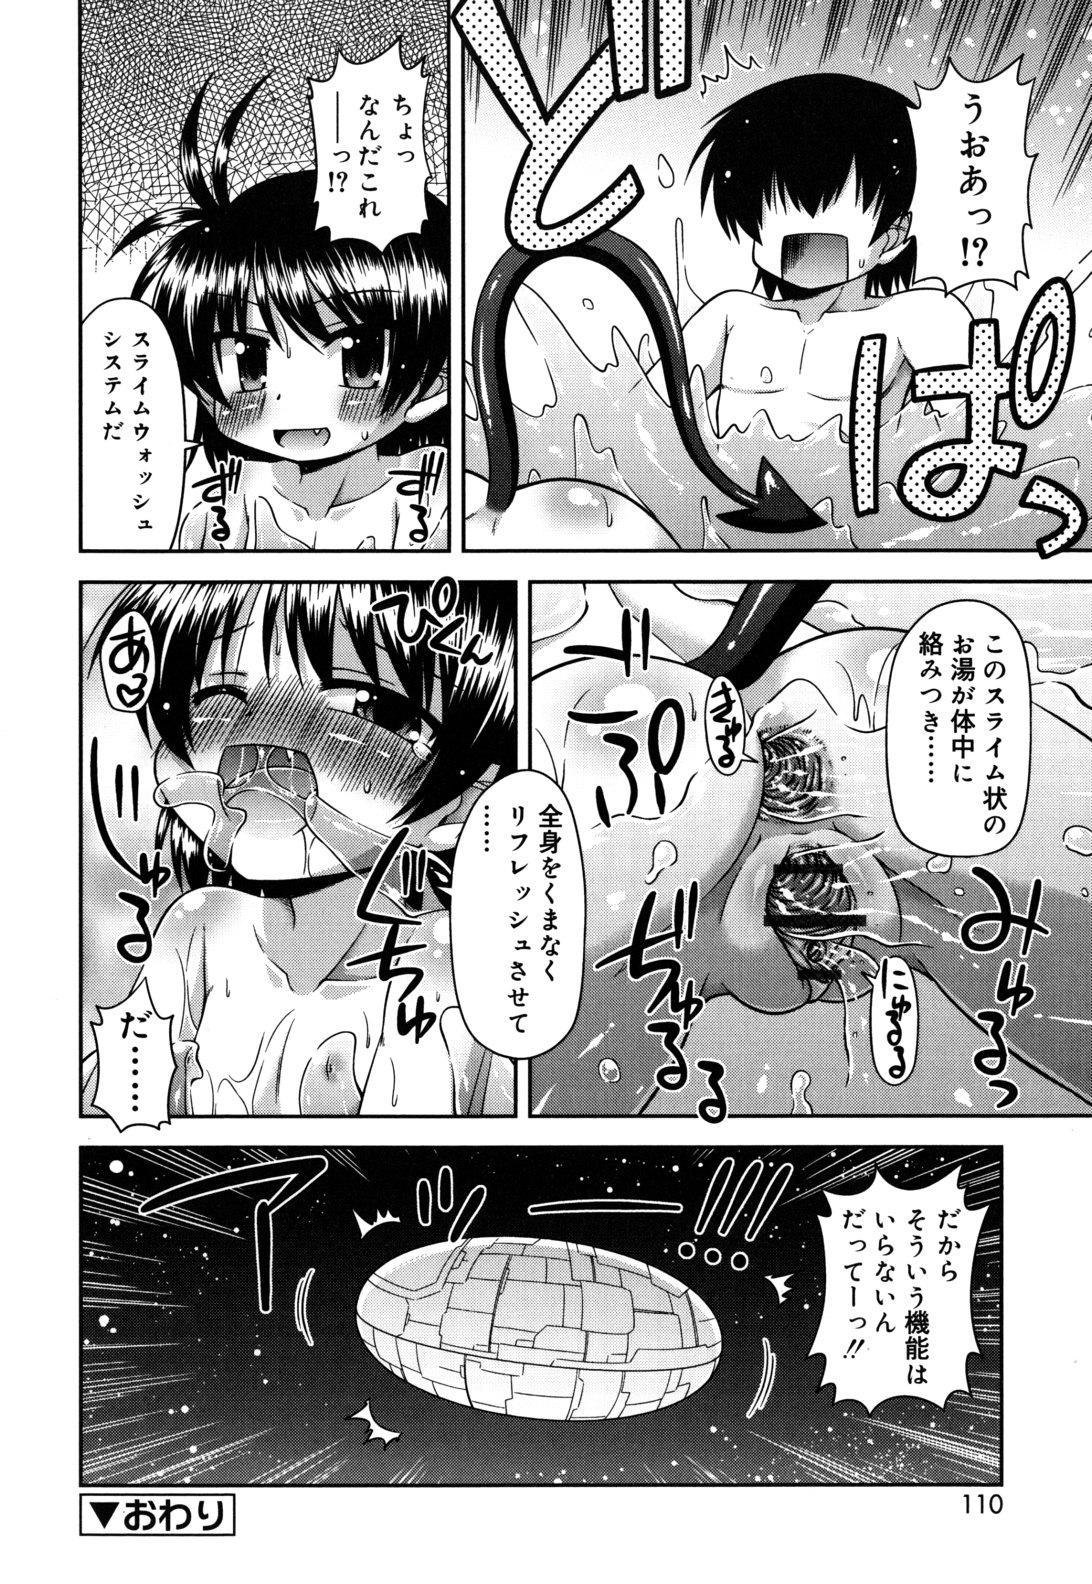 Chimatto Chaos Chikku 108